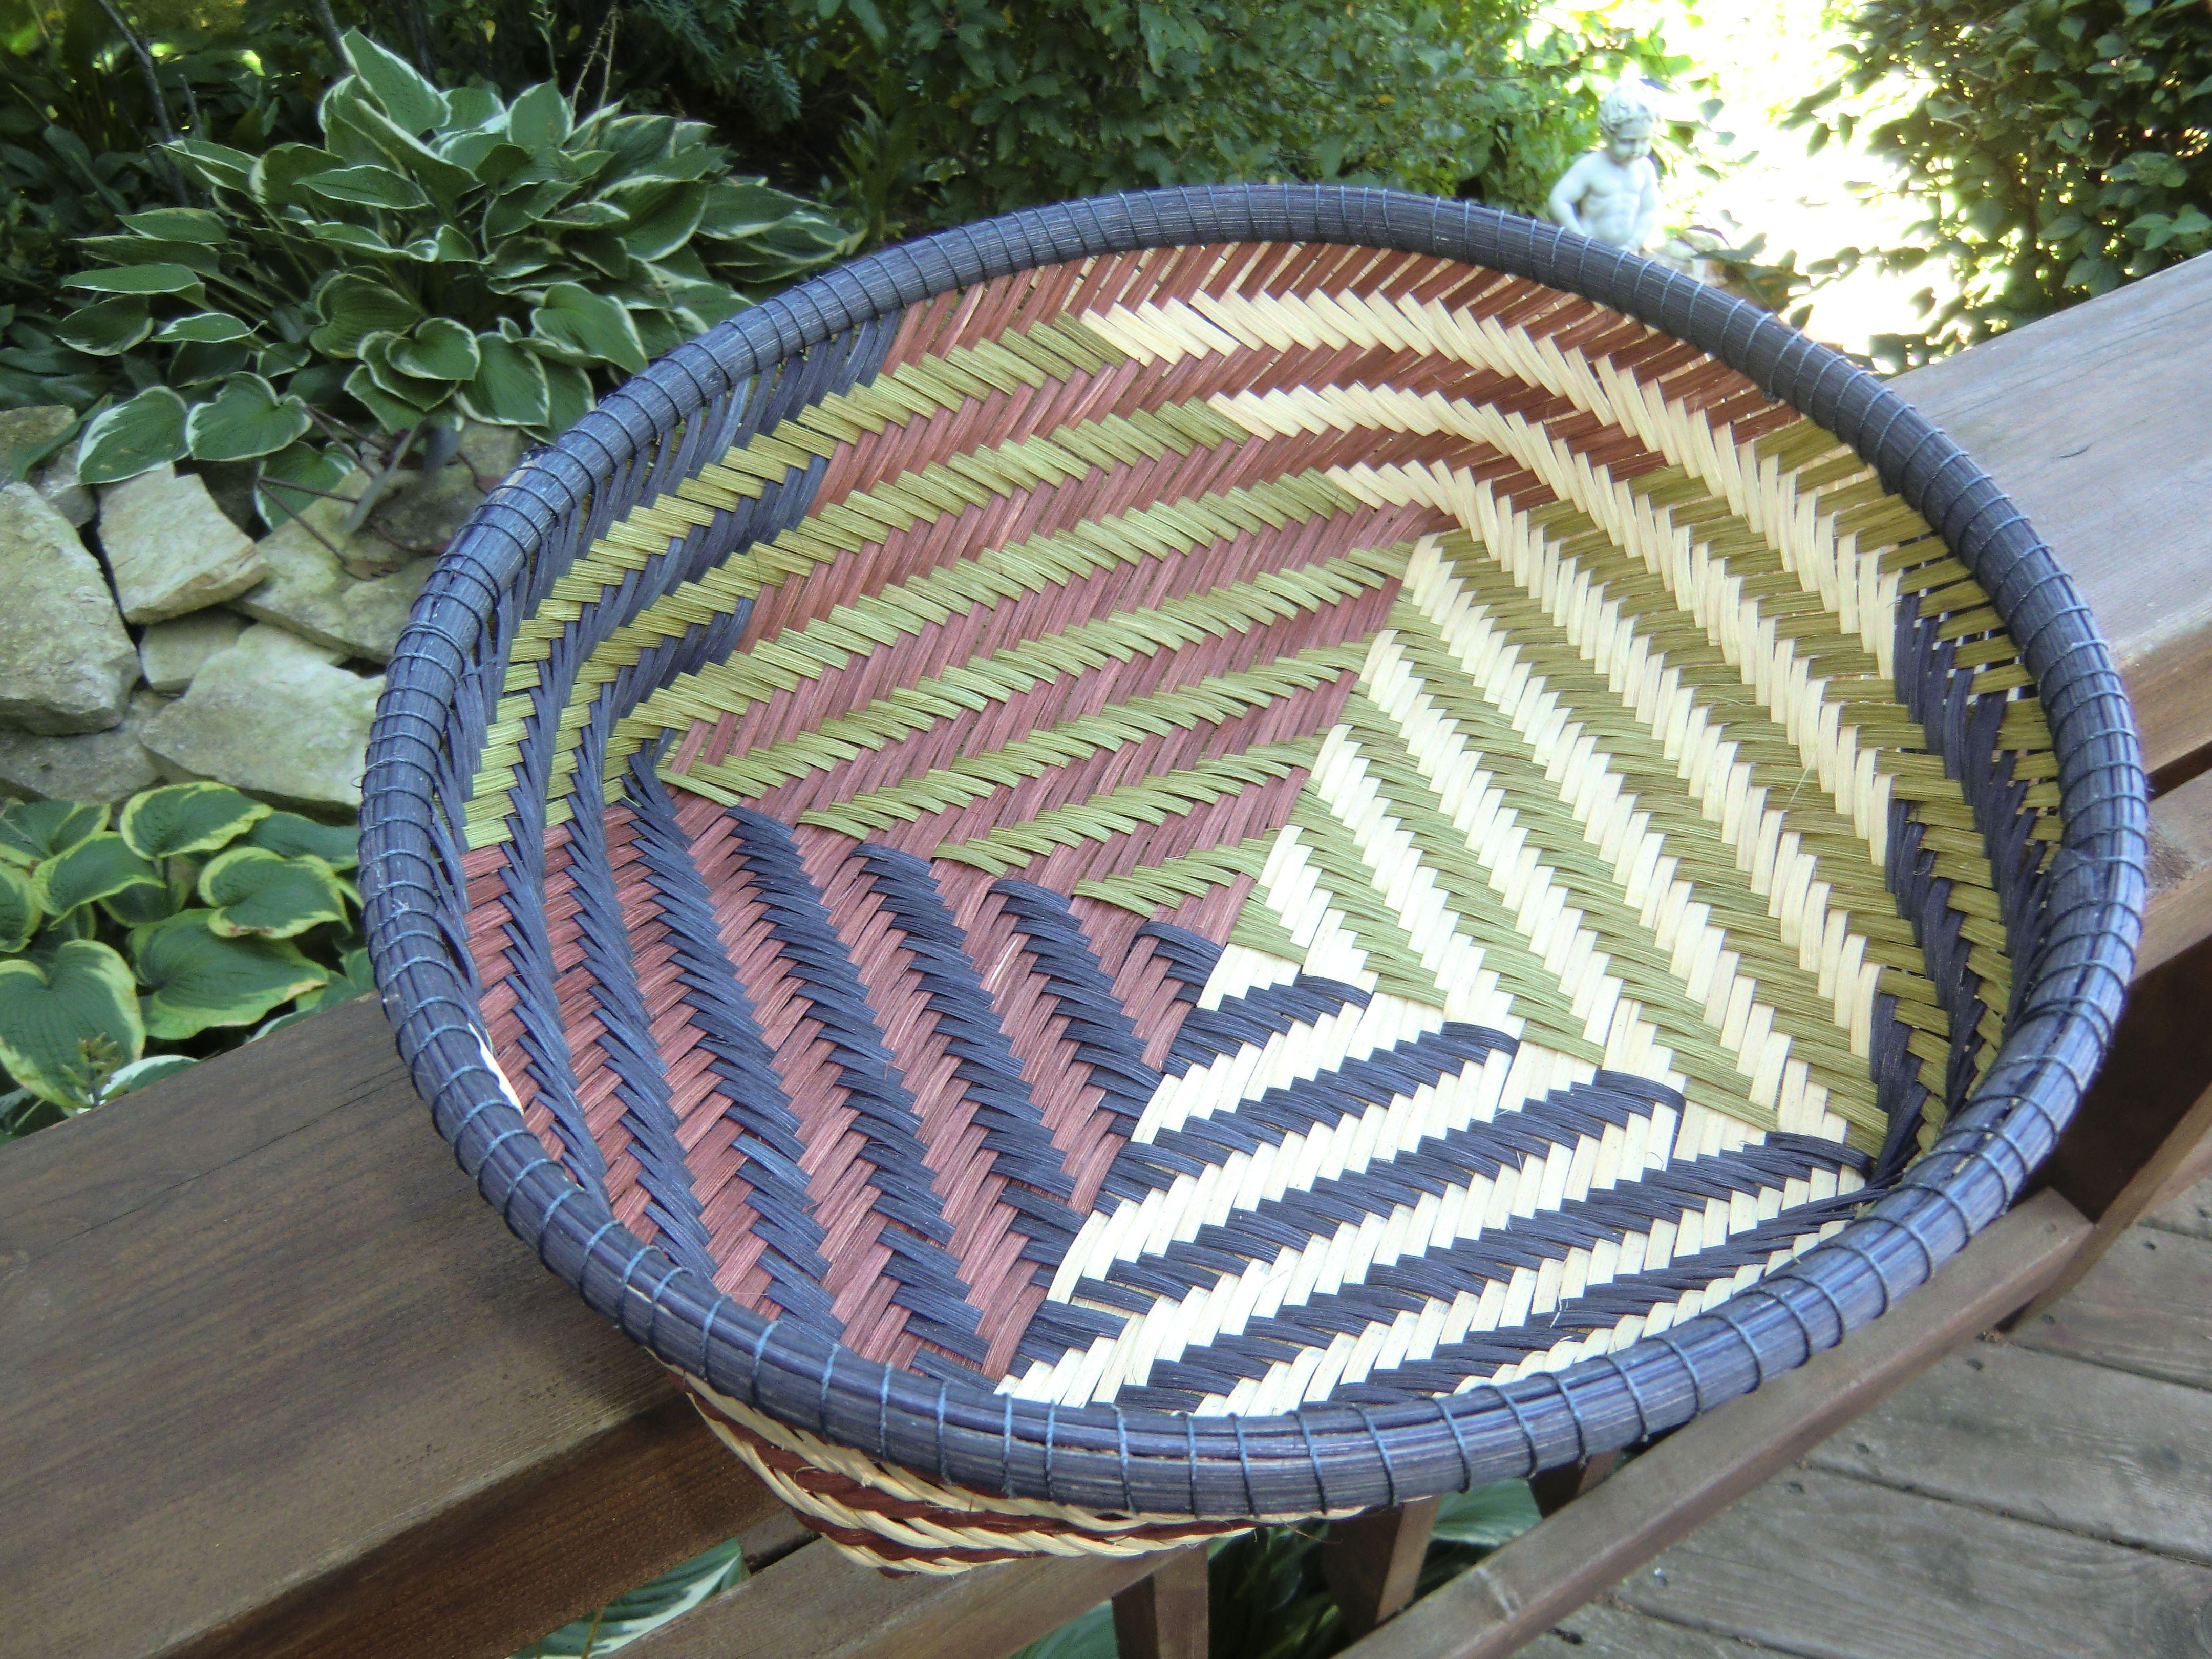 Basket Weaving Osi : Choctaw basket basketry native american cherokee